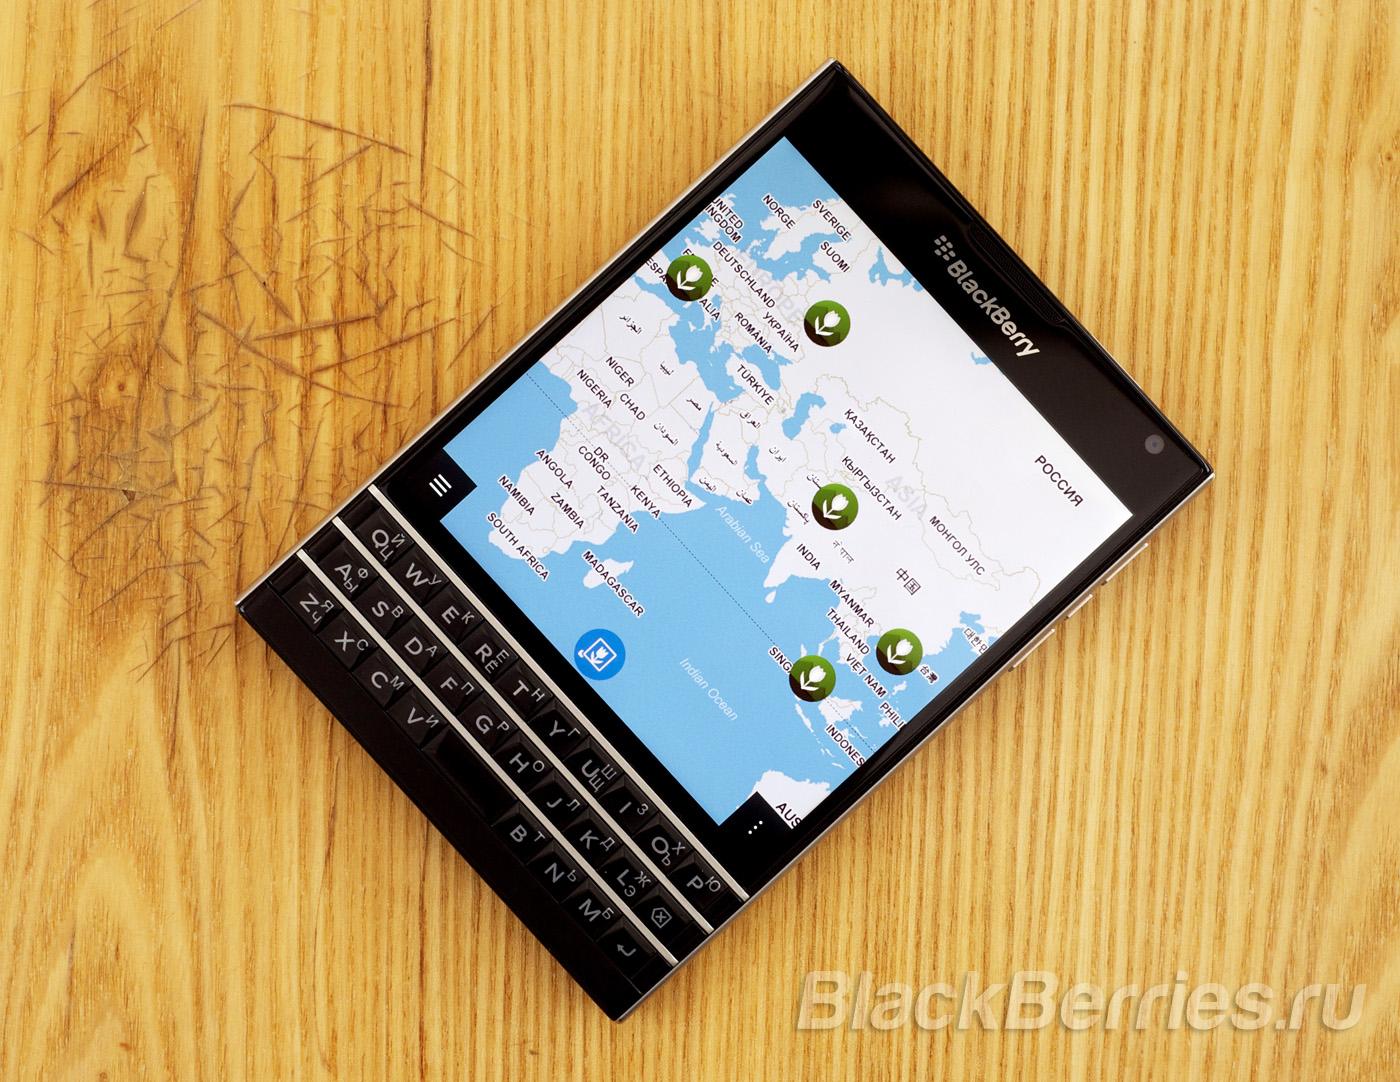 BlackBerry-Passport-Maps-images-2